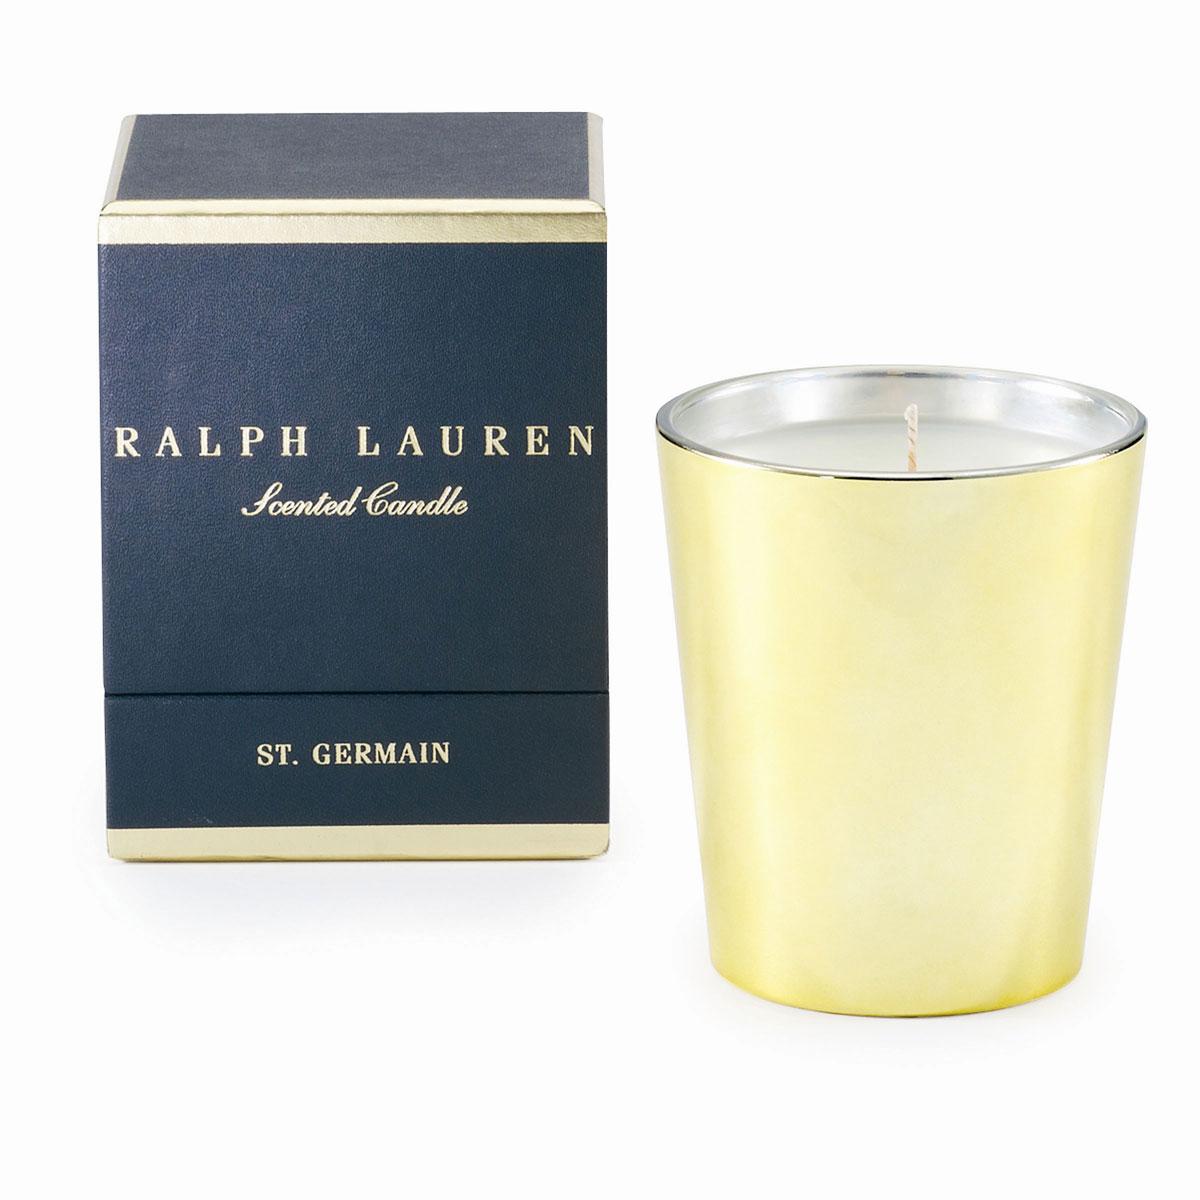 Ralph Lauren St Germain Single Wick Scented Candle